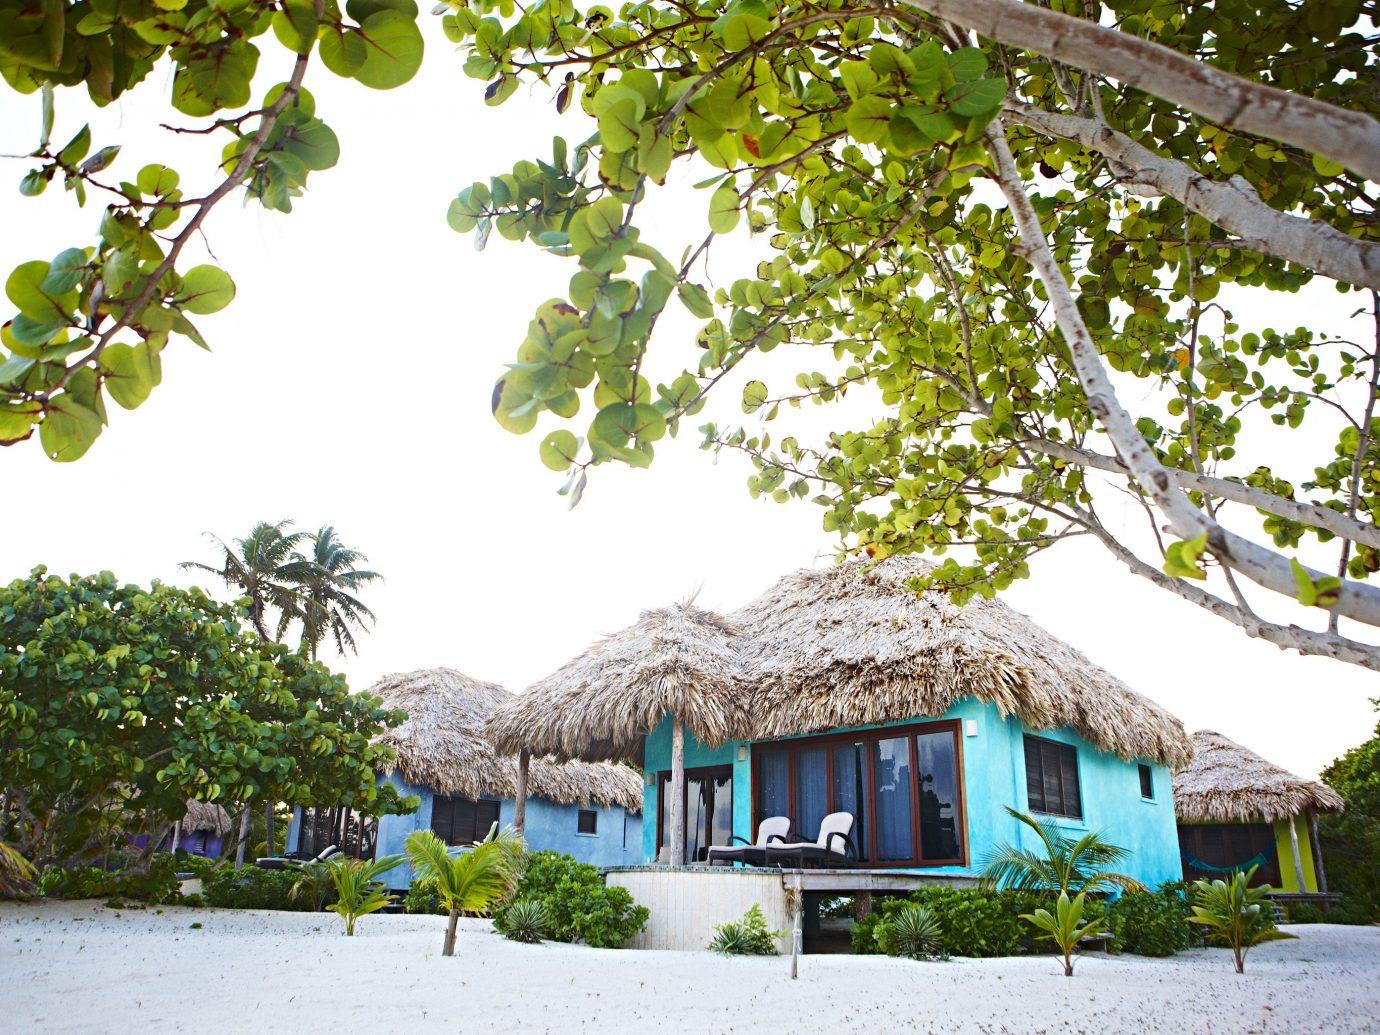 Matachica Beach Resort In Ambergris Caye, Belize